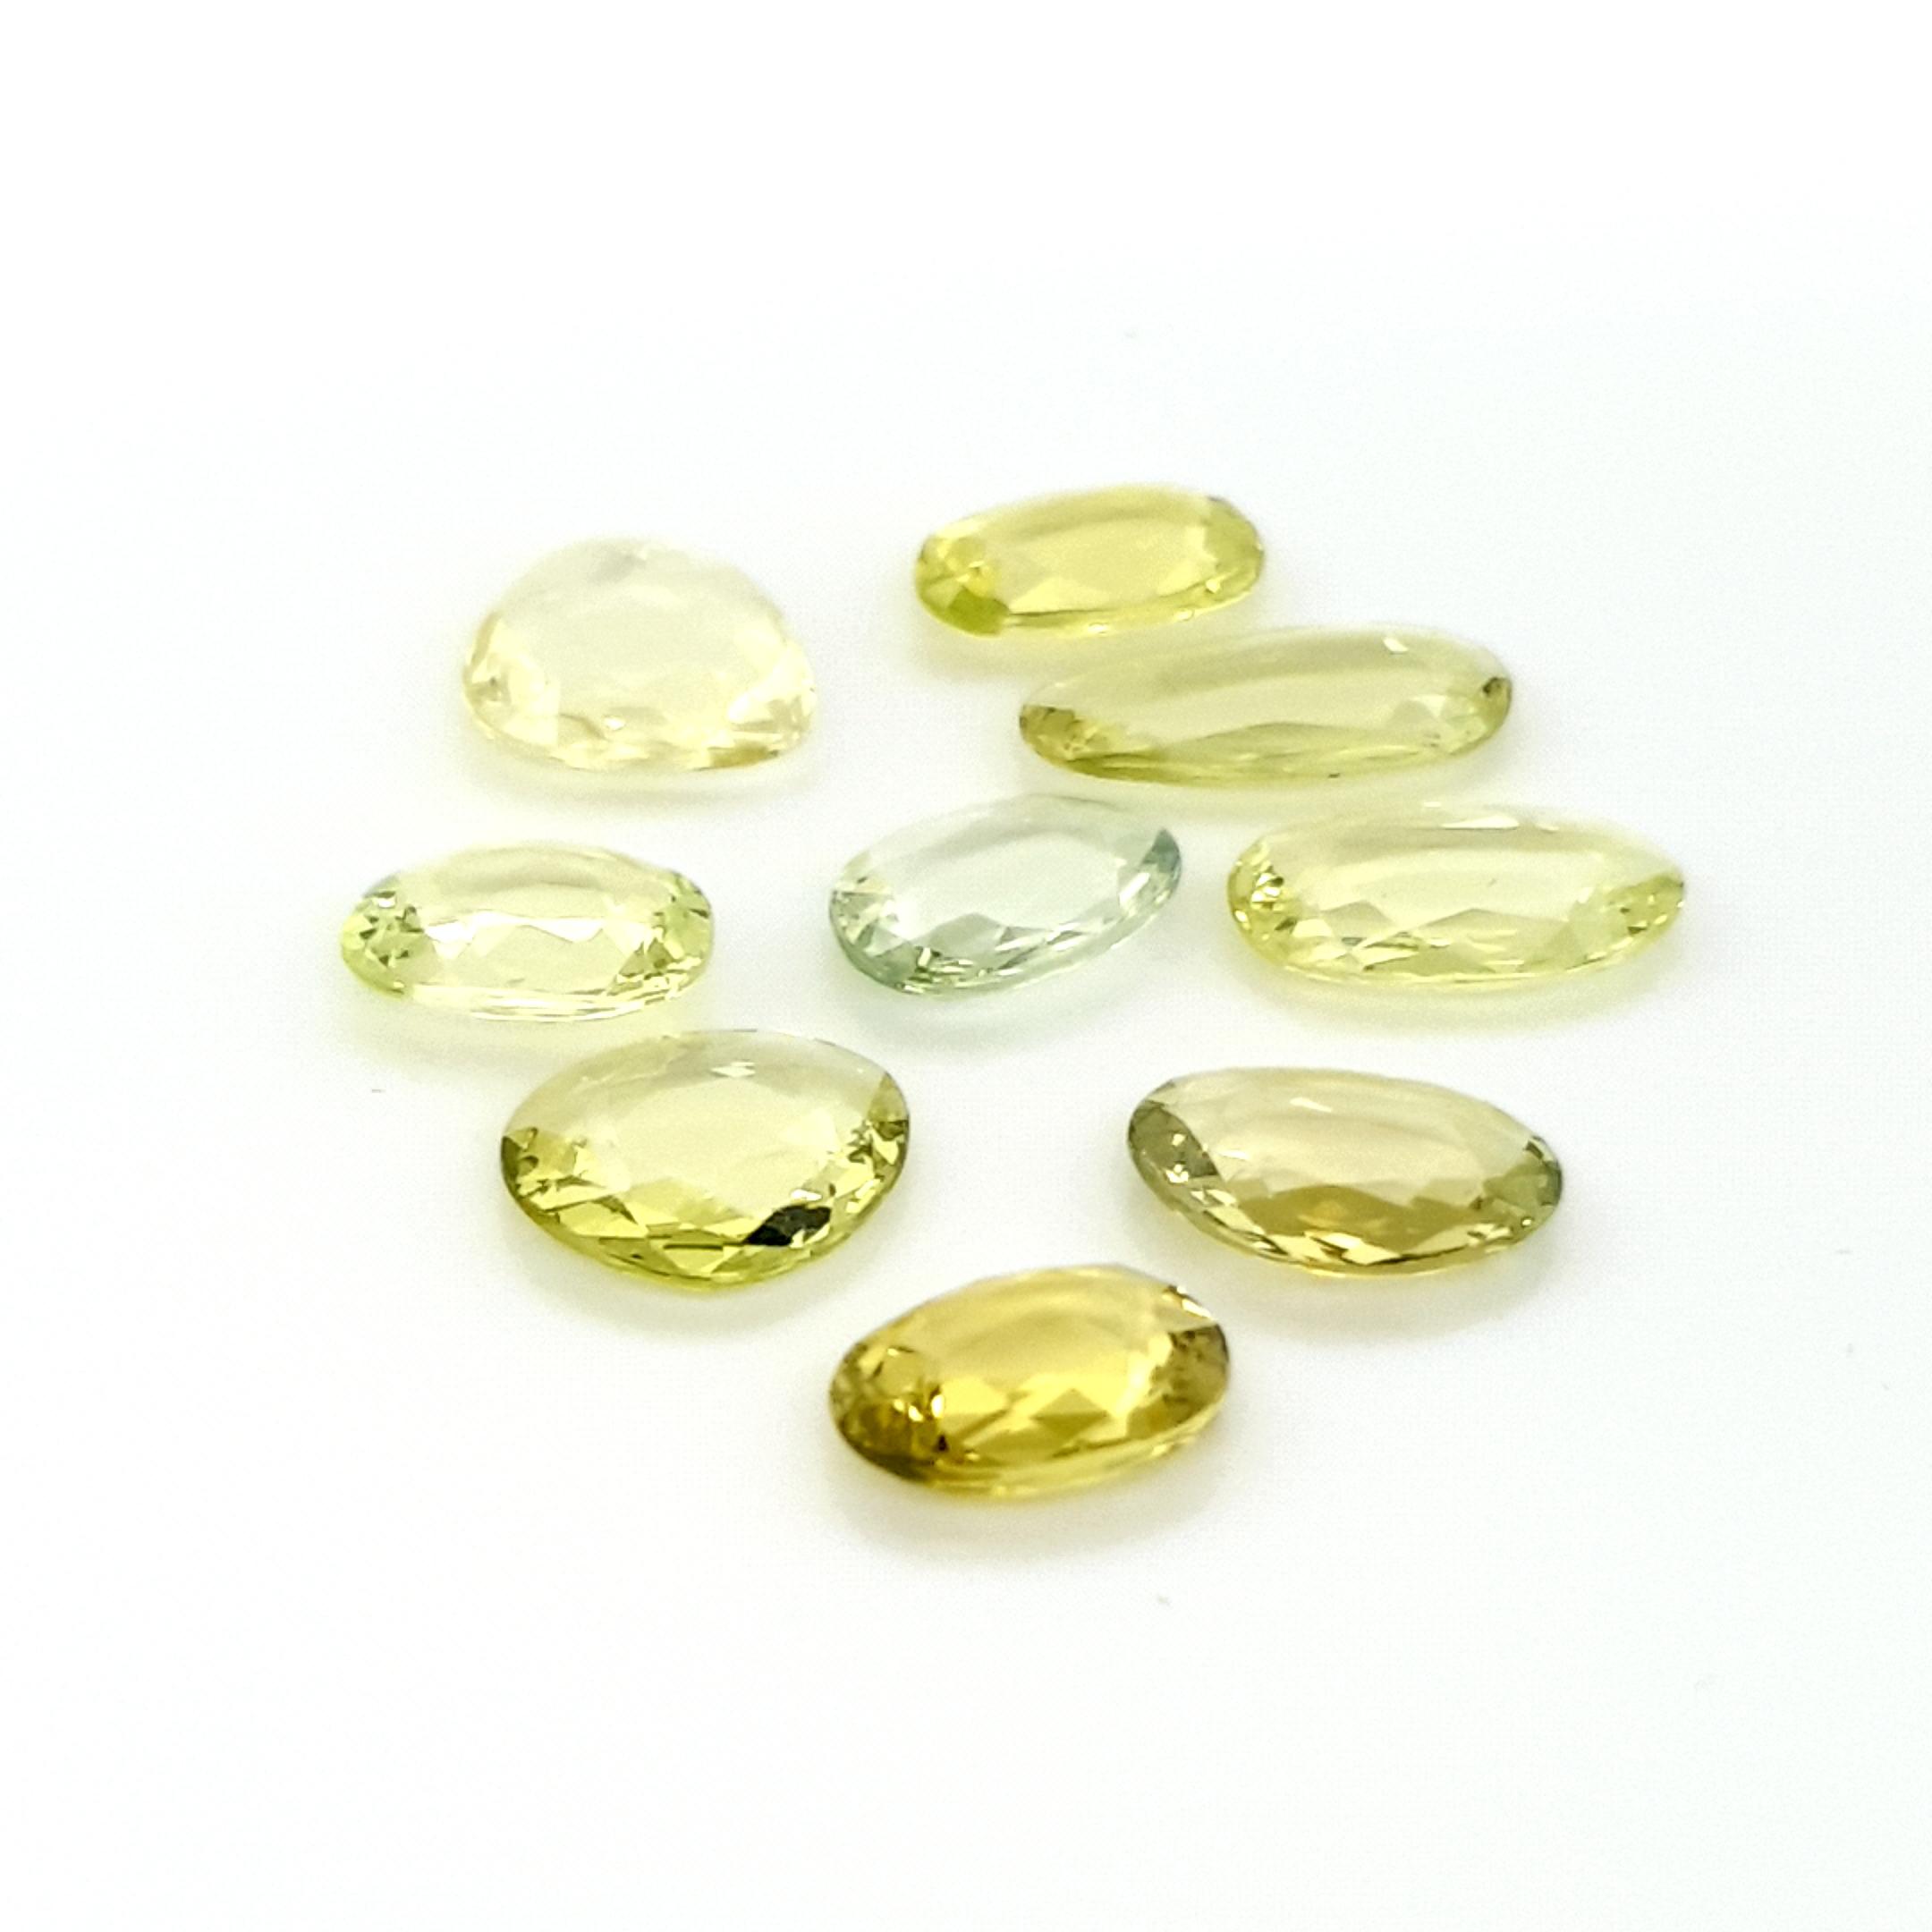 2,00-3,00ct.size Chrysoberyl DoubleRoseCut CBK17C5 ClaudiaHamann__2021-03-22-22-45-19